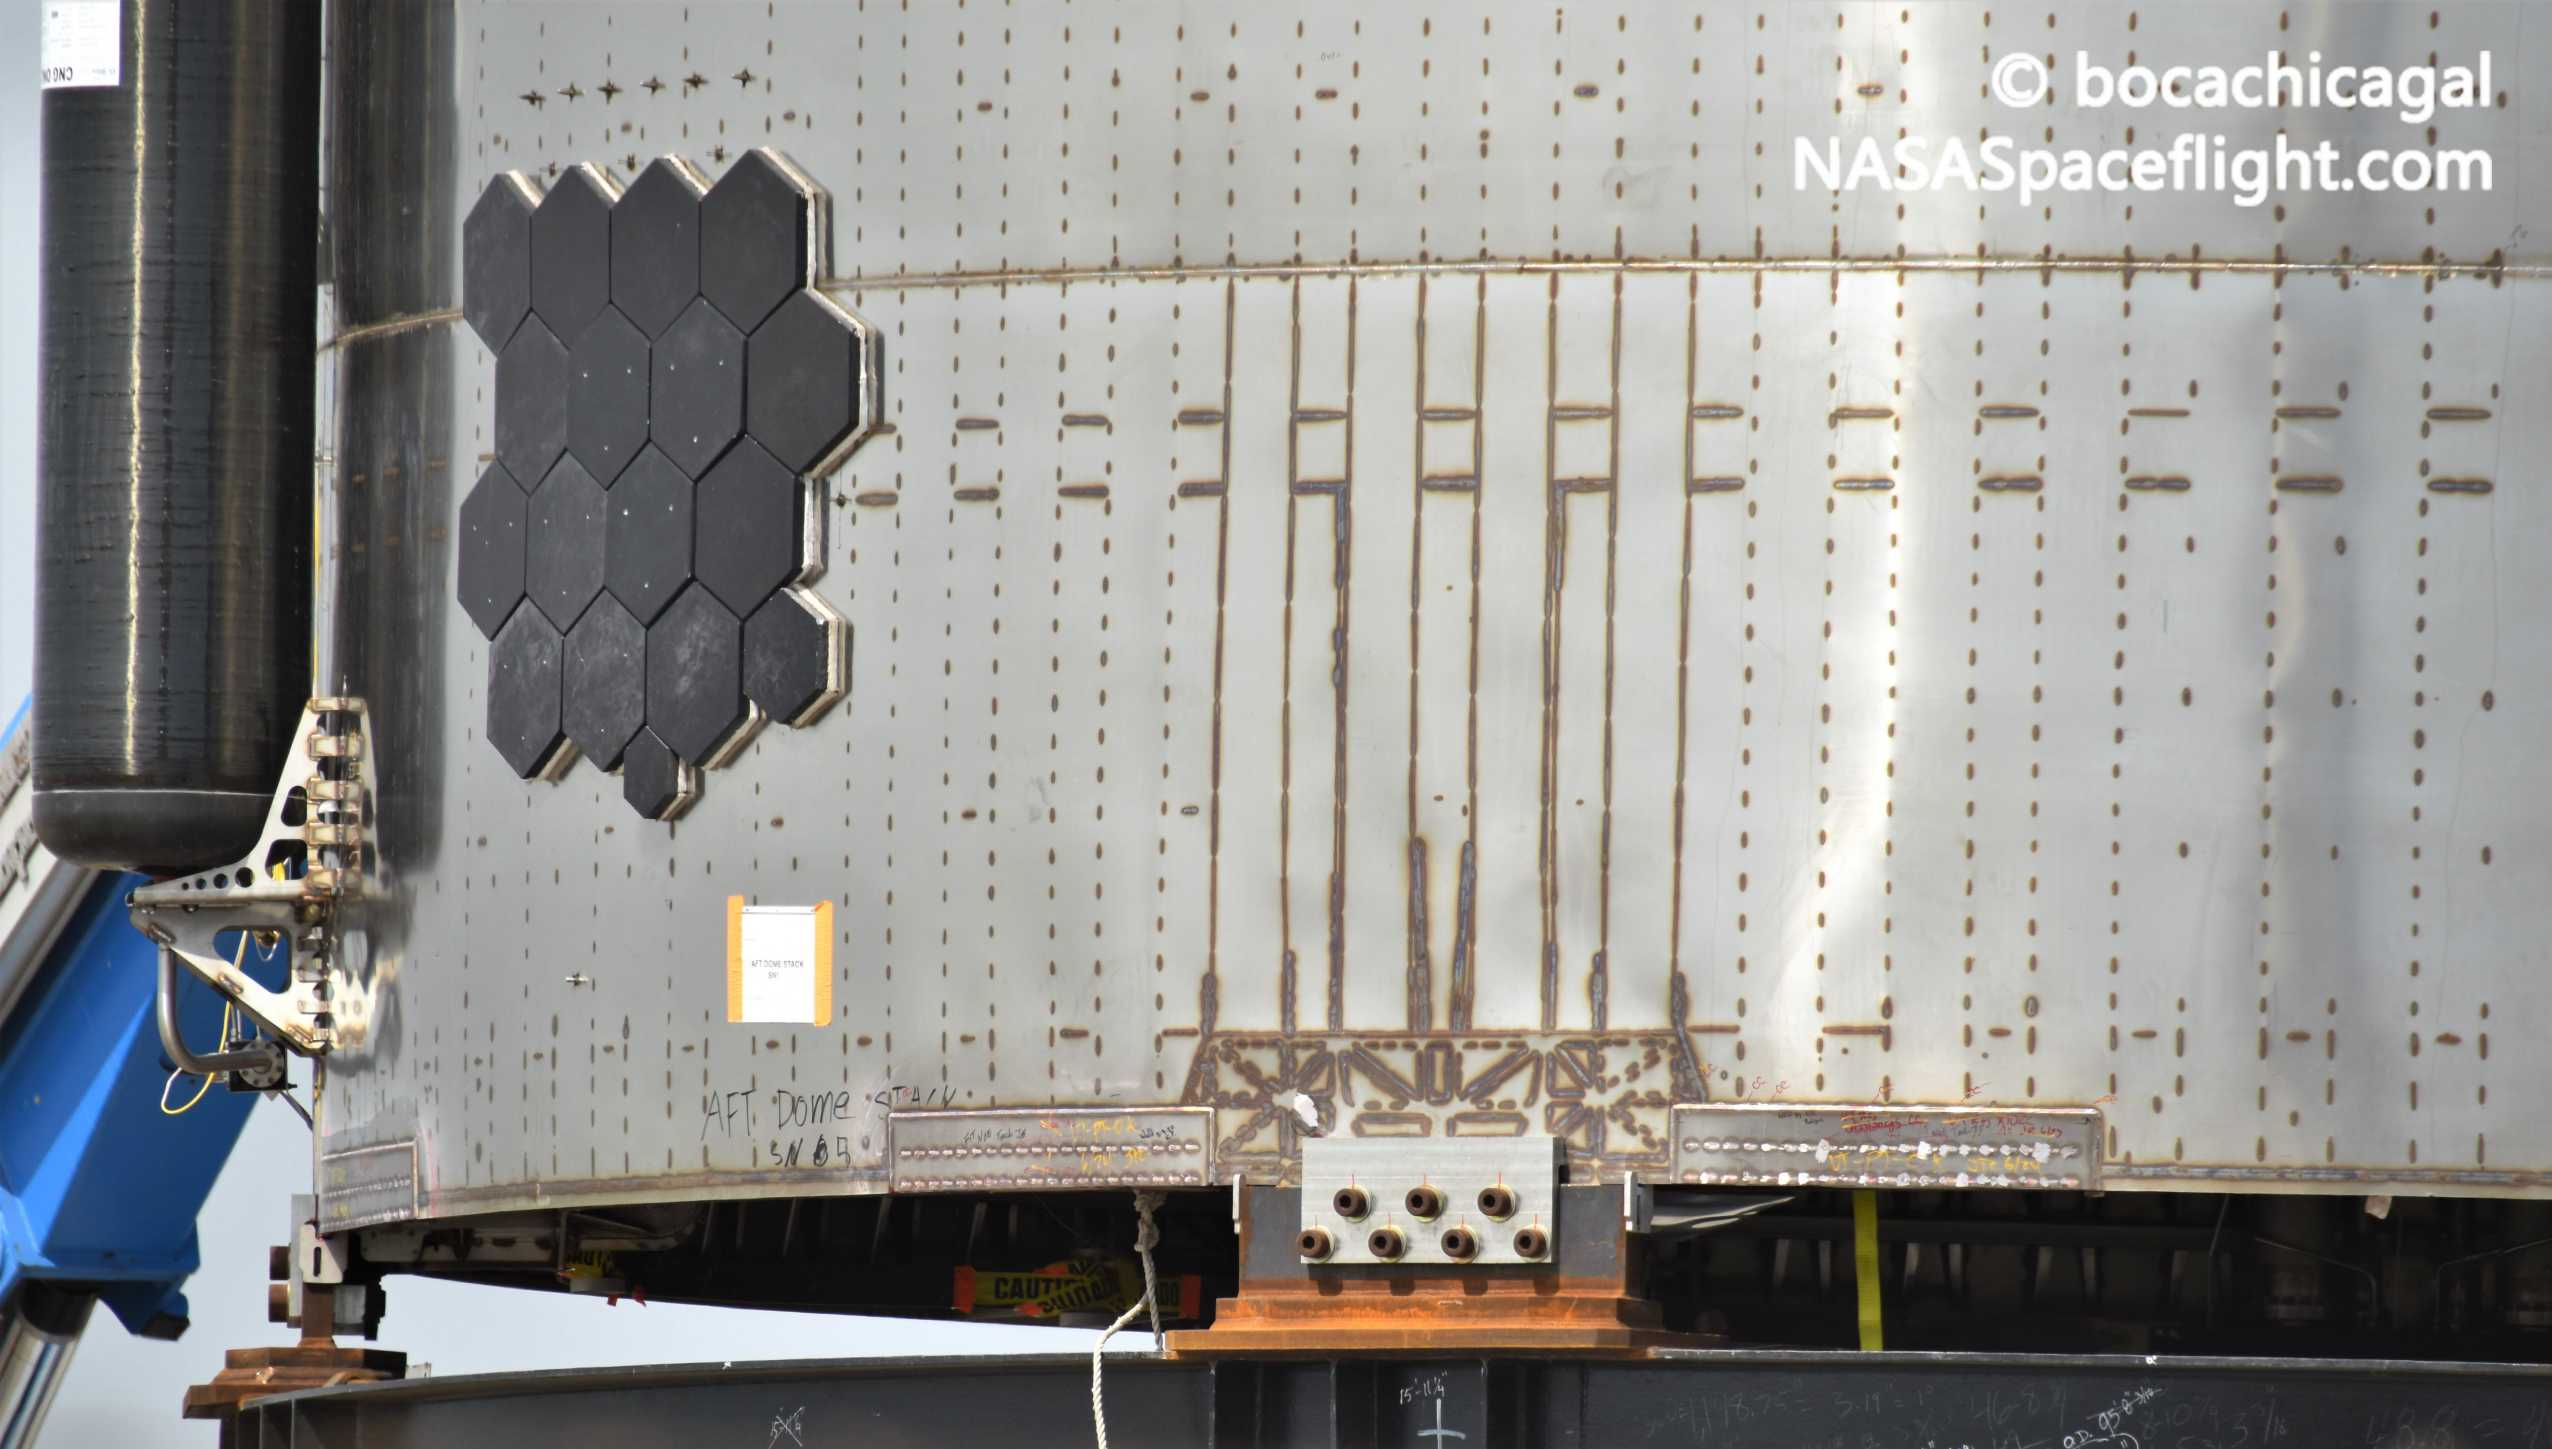 Starship Boca Chica 062420 (NASASpaceflight – bocachicagal) SN5 mount install 2 crop (c)